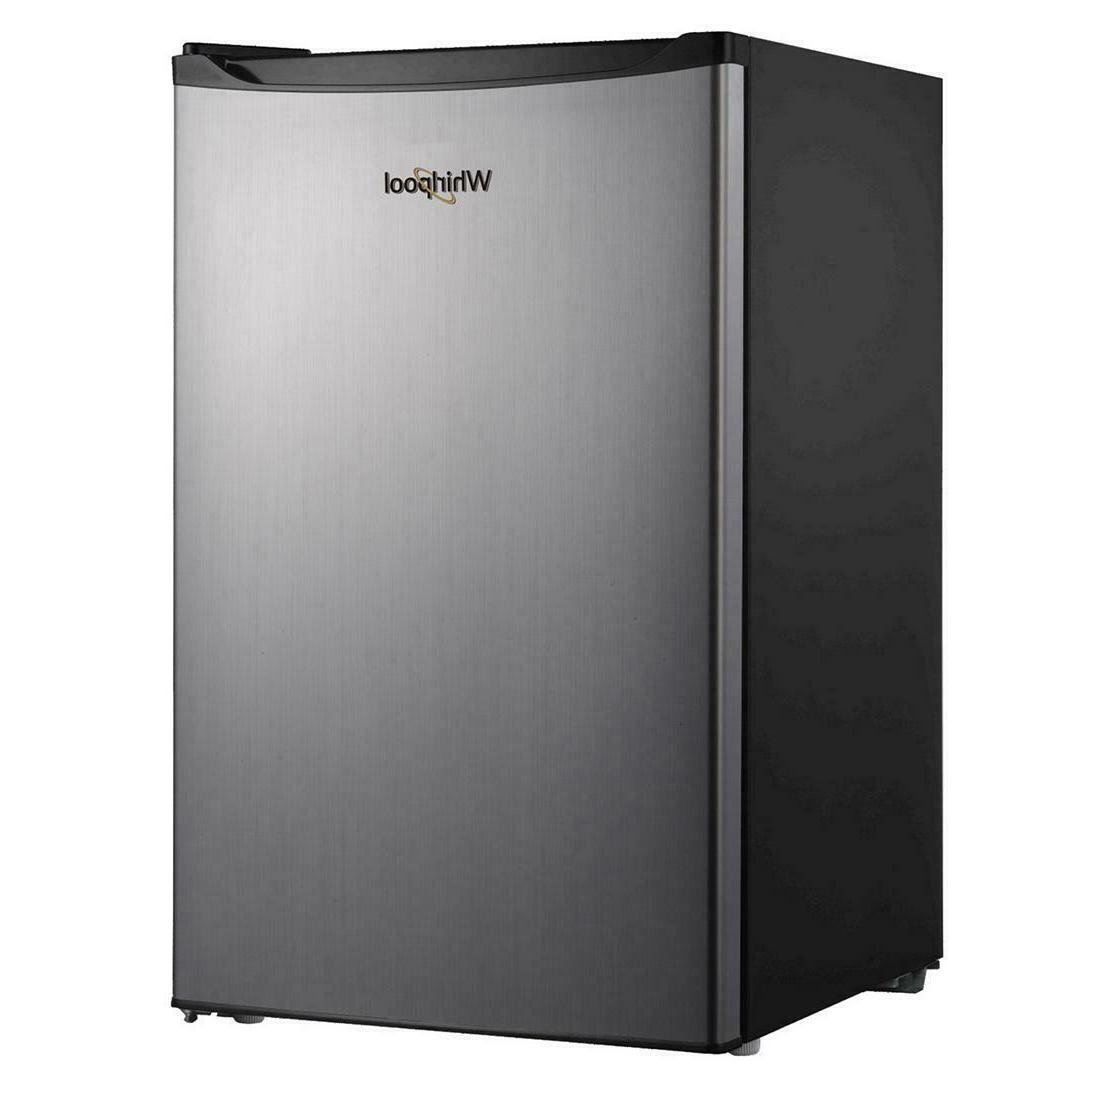 4 3 cu ft compact mini fridge